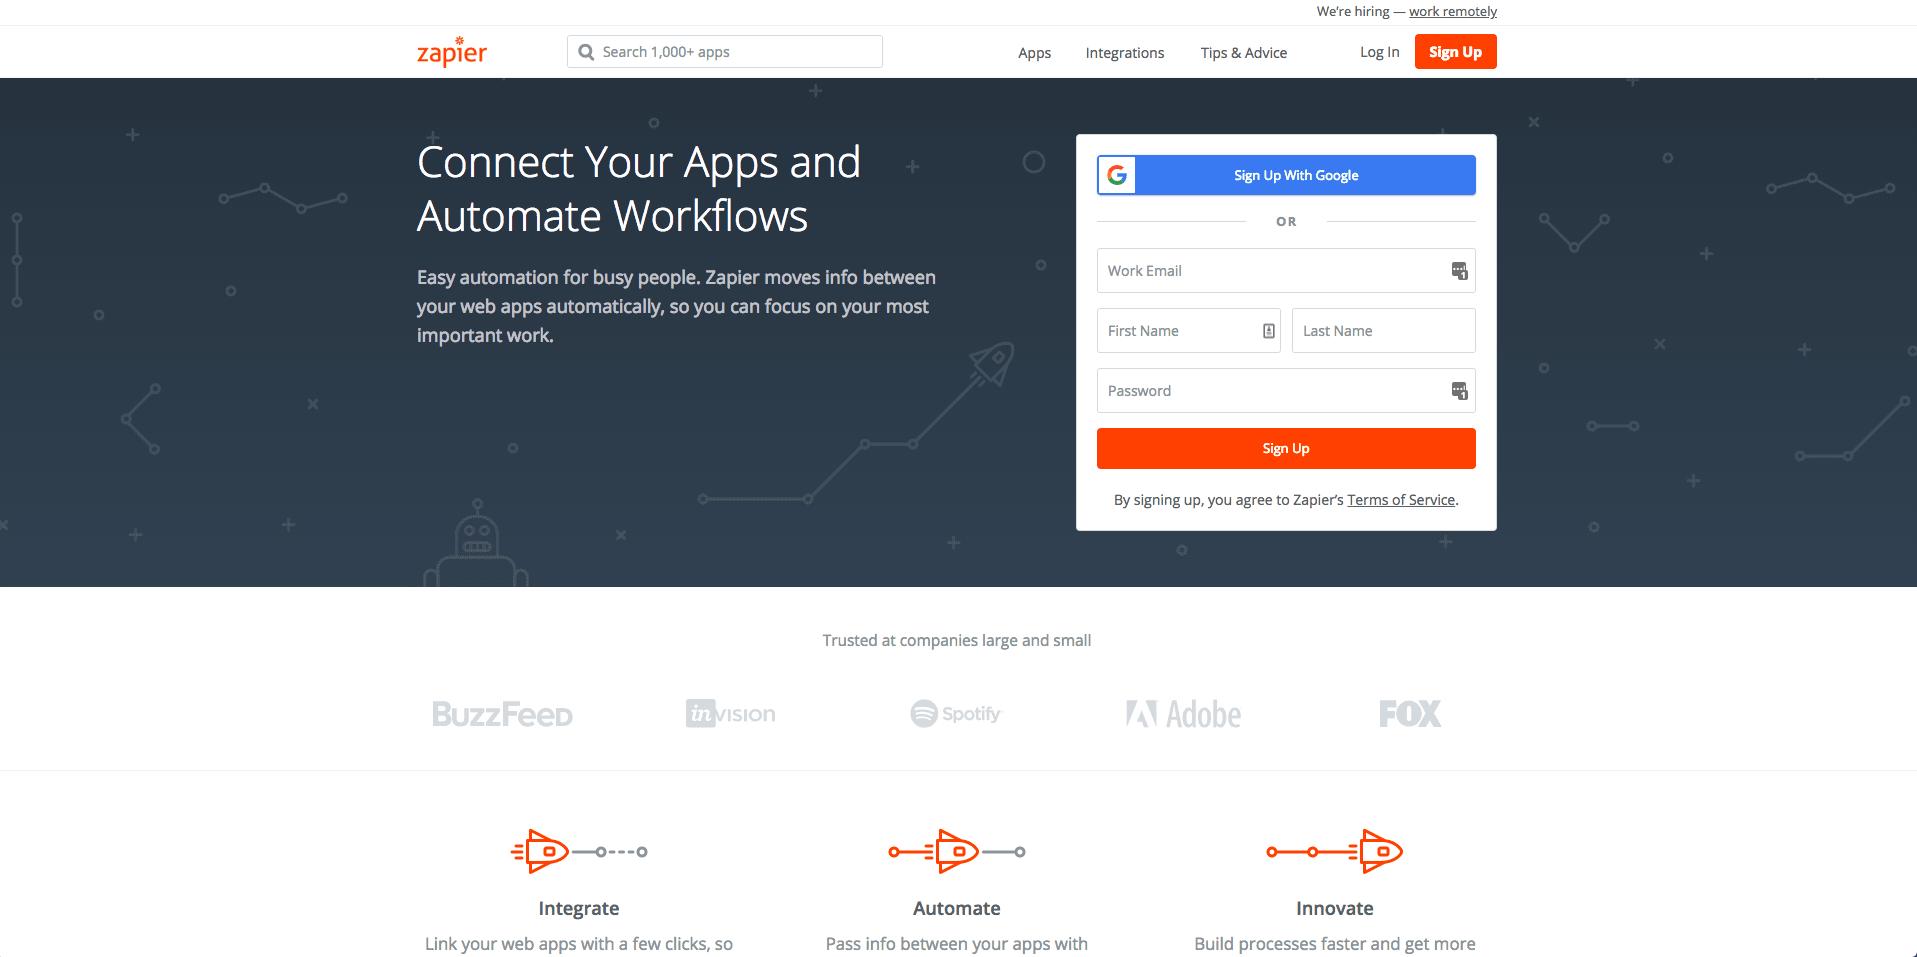 screenshot of Zapier's homepage